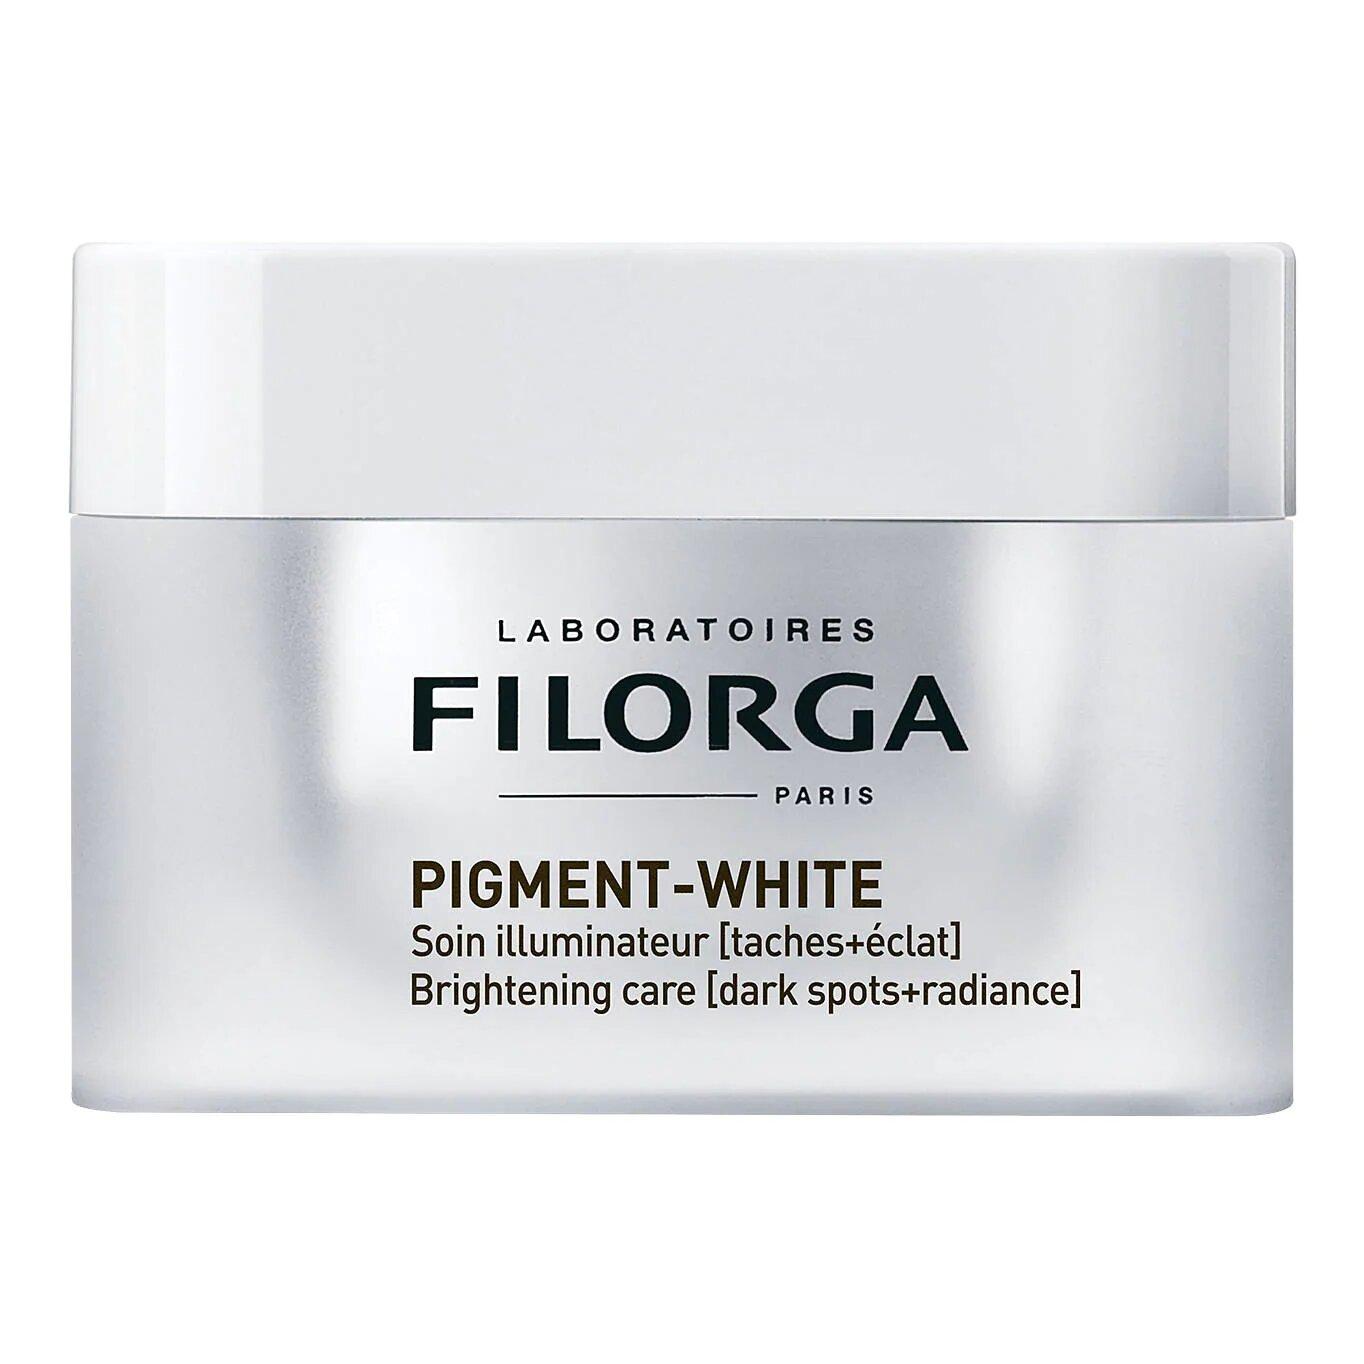 Pigment-White Tratamiento iluminador [manchas + luminosidad] Filorga